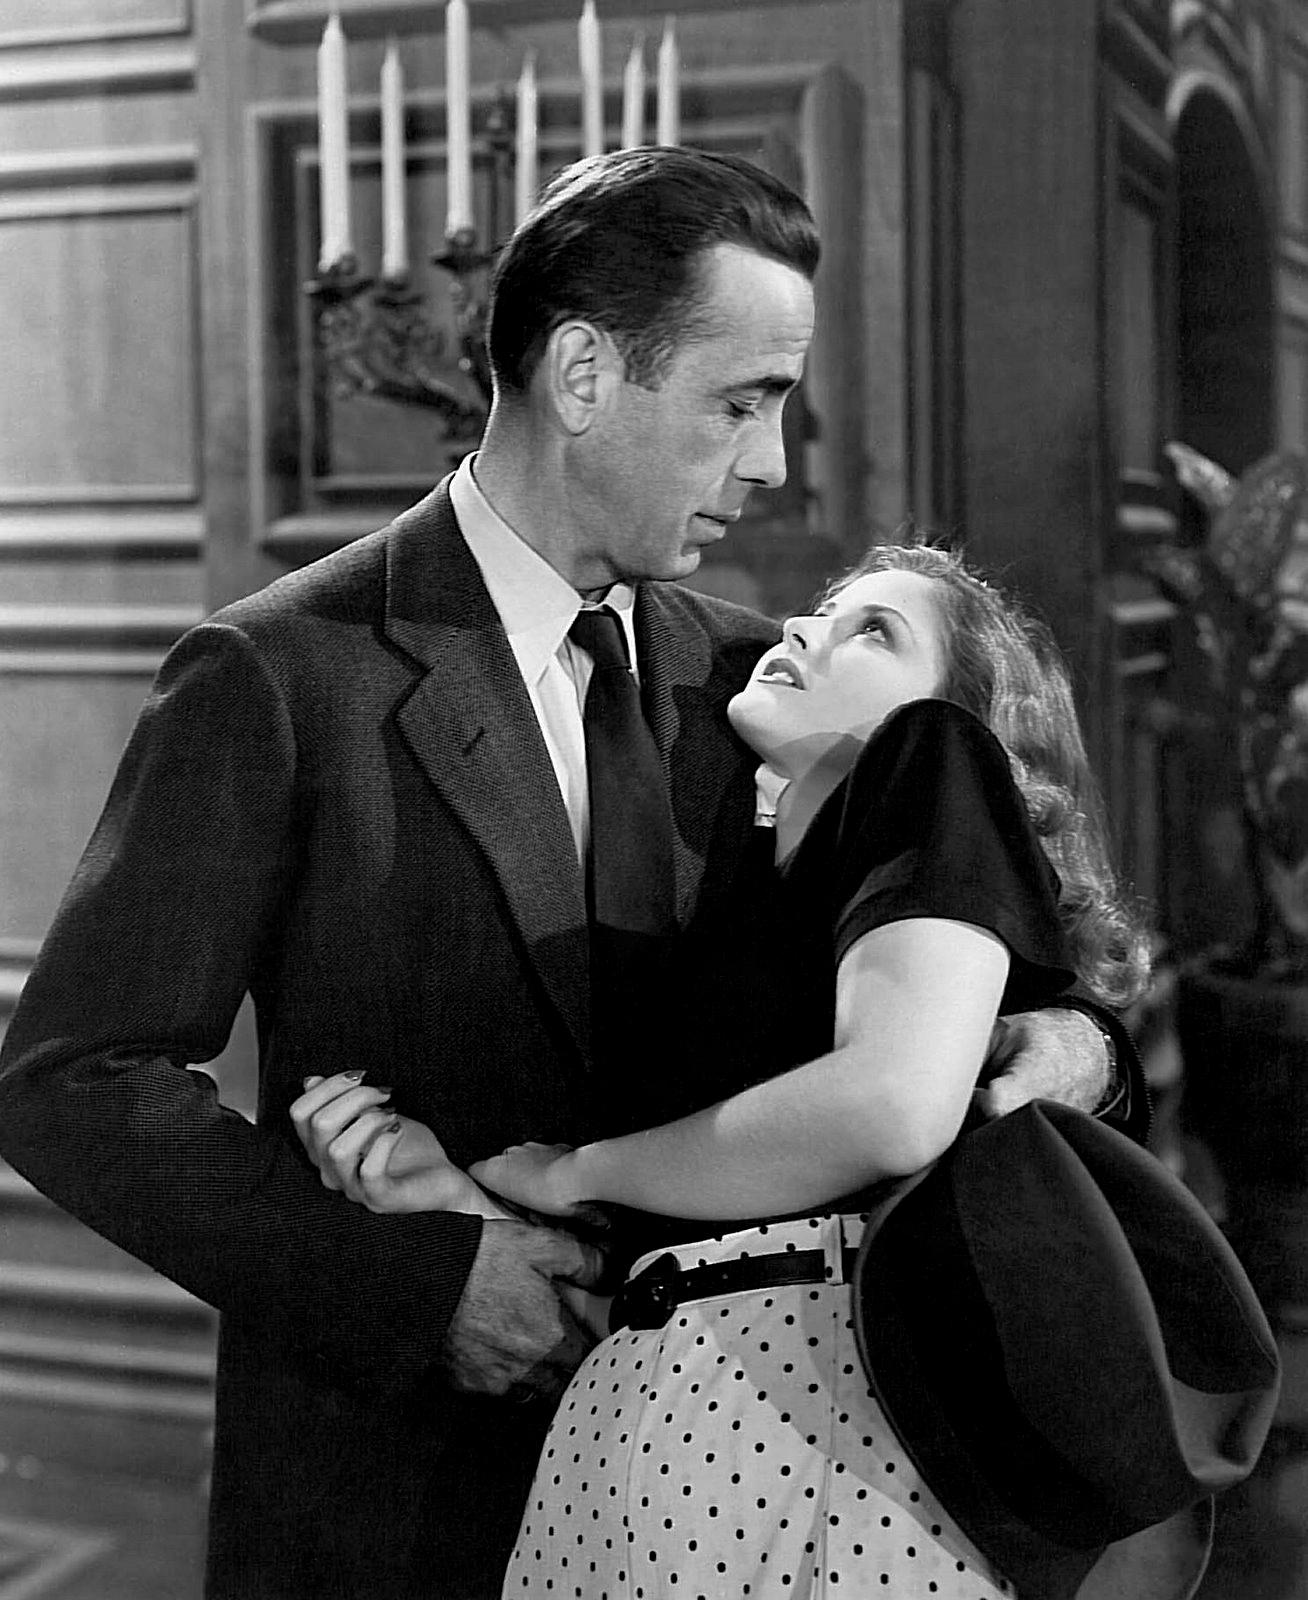 184. The Big Sleep (1946)